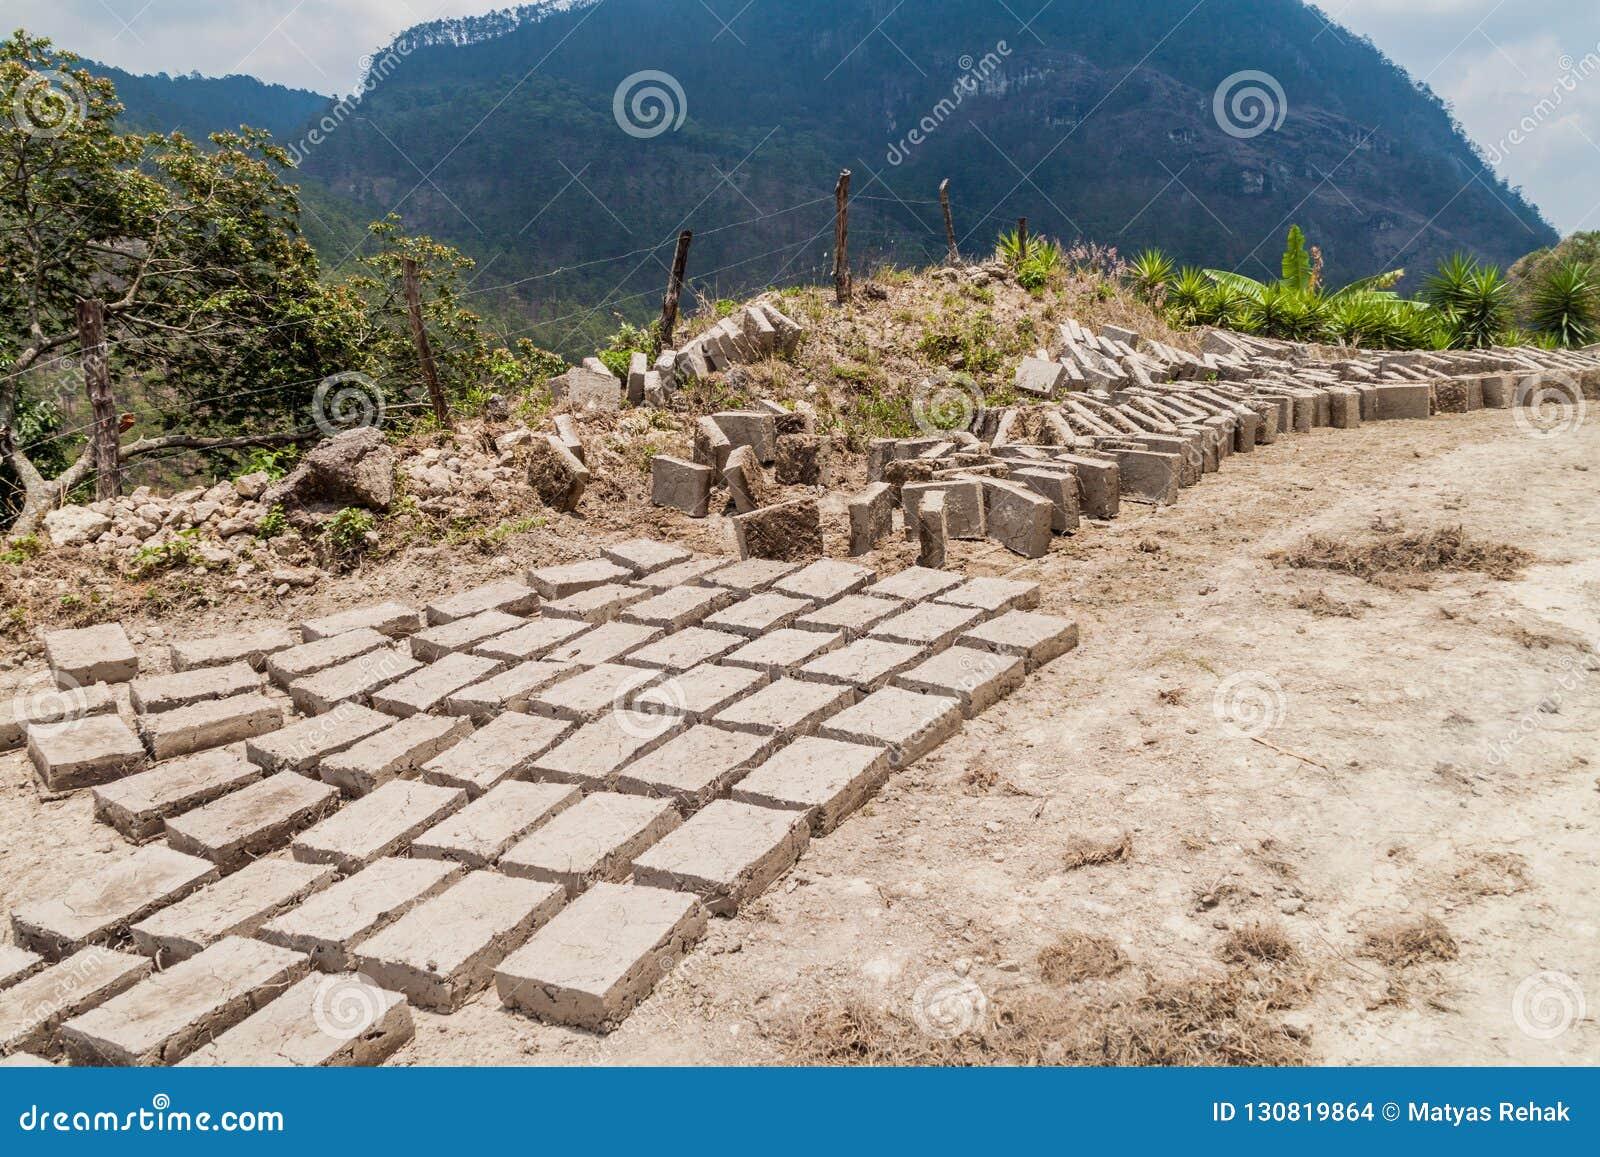 Adobe bricks dry in Belen Gualcho village, Hondur